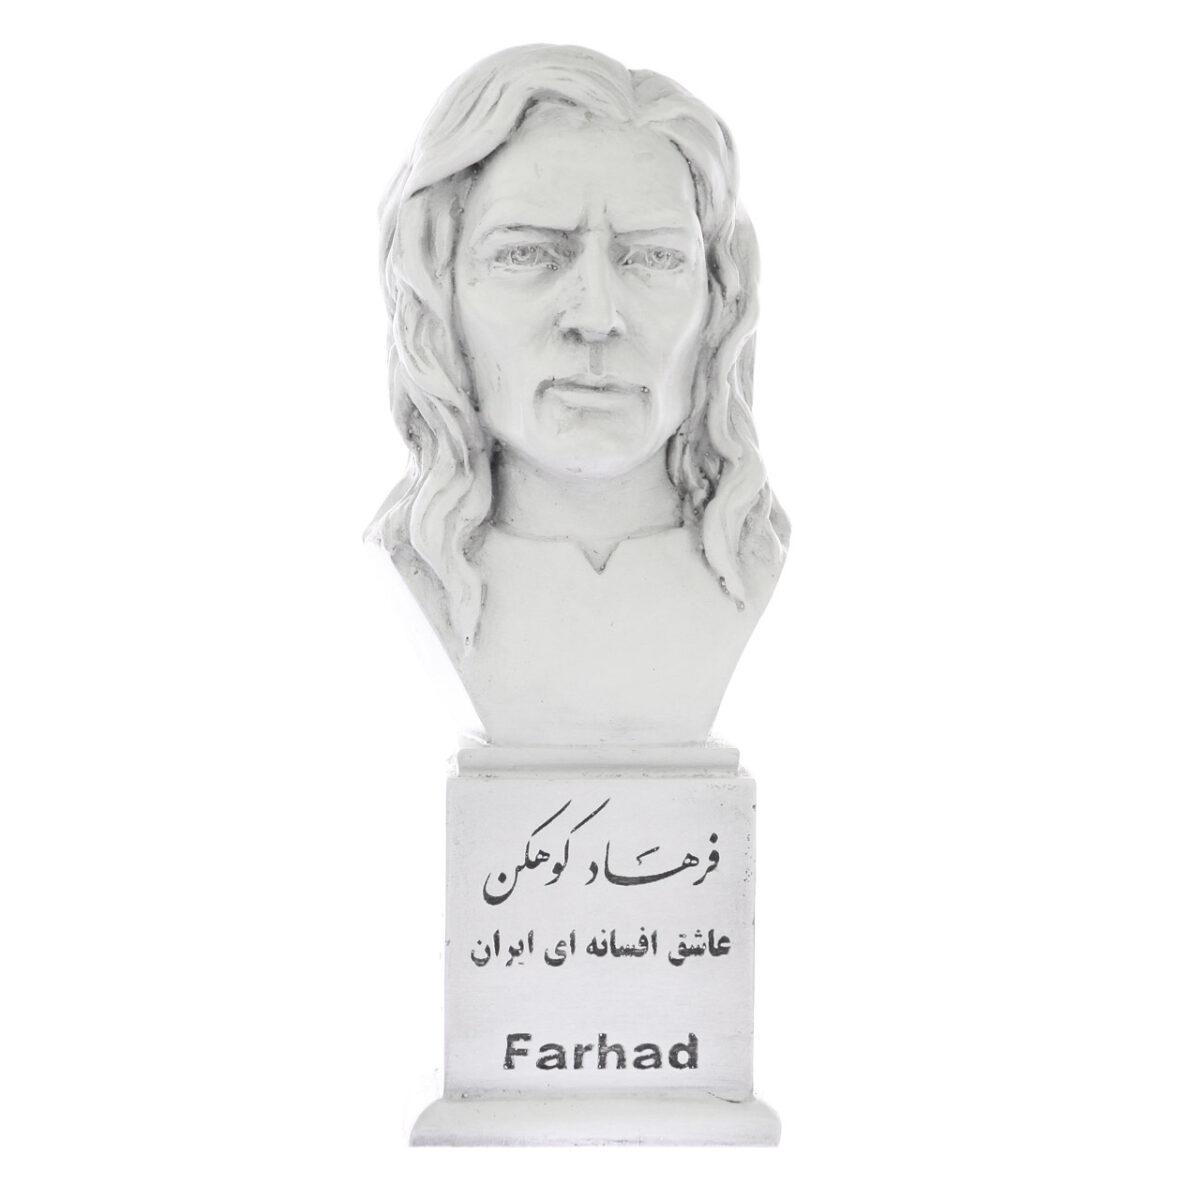 farhad s 1200x1200 - سردیس فرهاد کوهکن